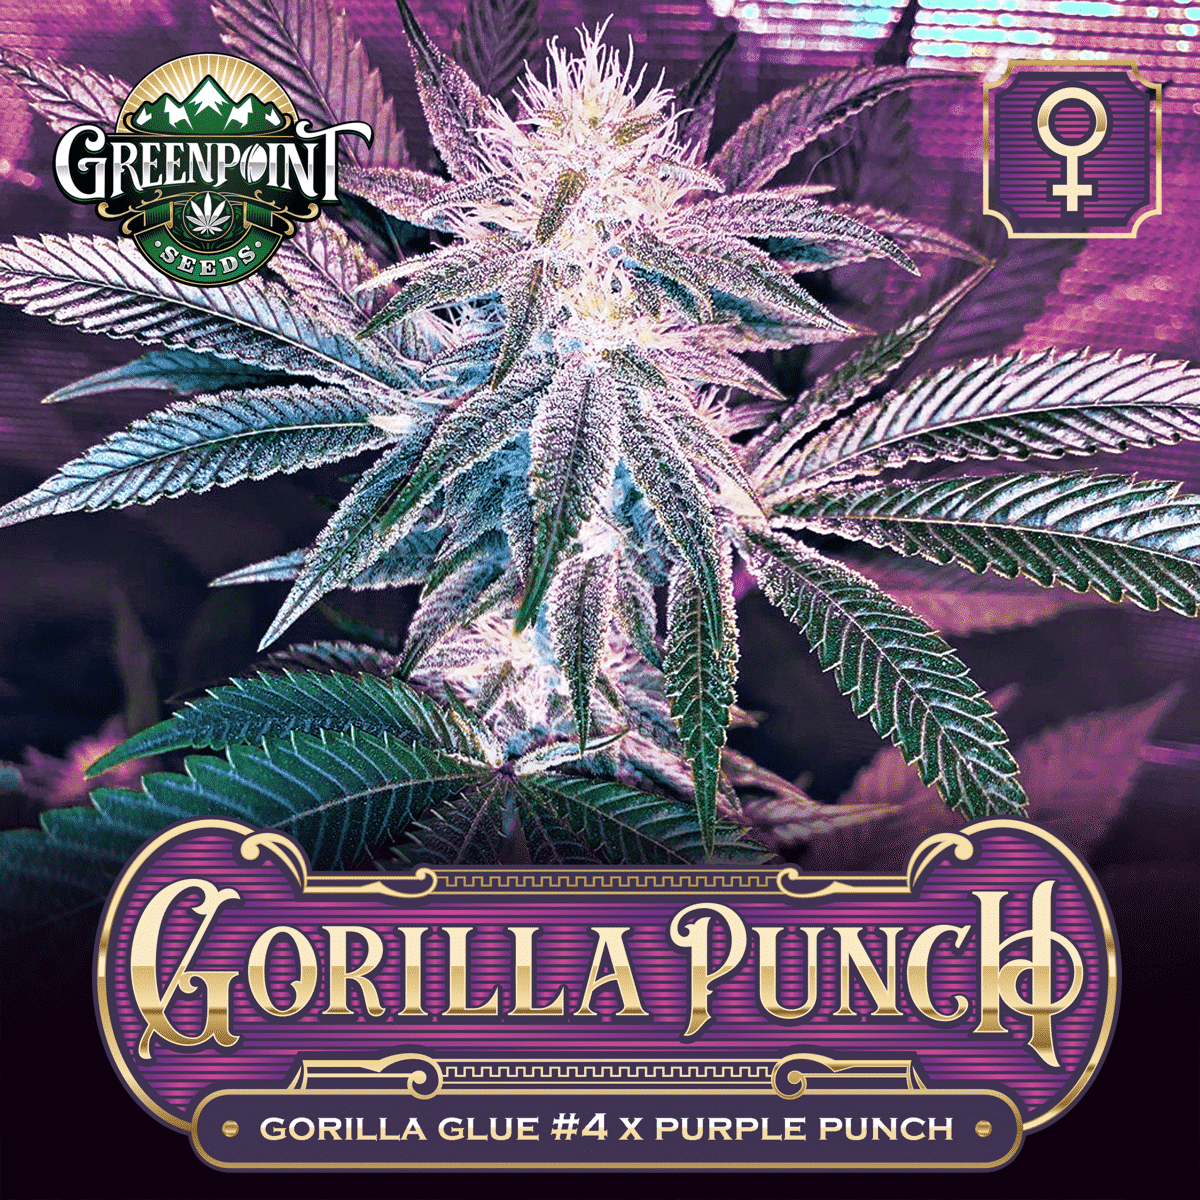 Gorilla Punch Feminized Cannabis Seeds - GG4 x Purple Punch Seeds